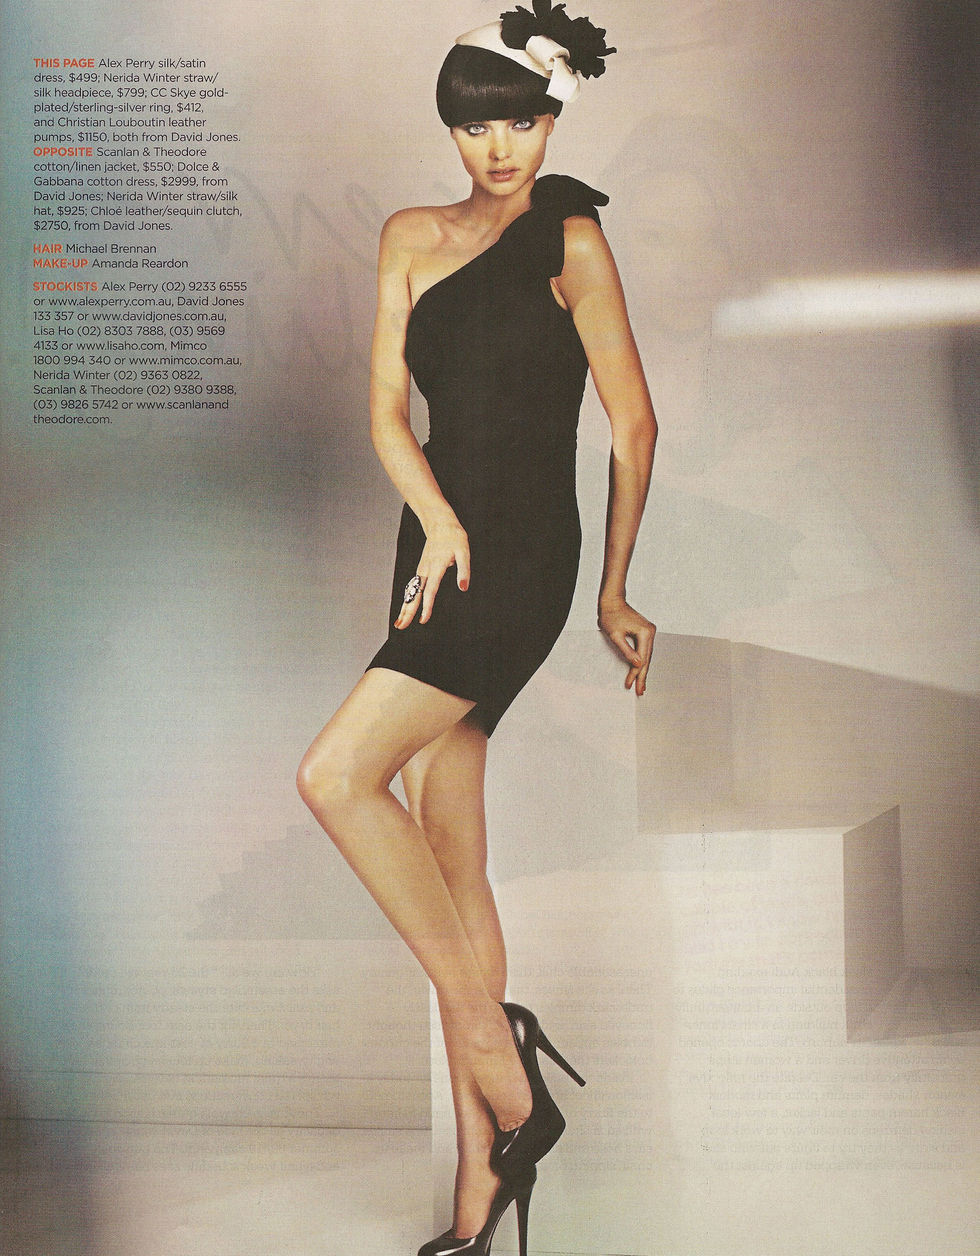 miranda-kerr-sunday-herald-sun-magazine-november-2009-01